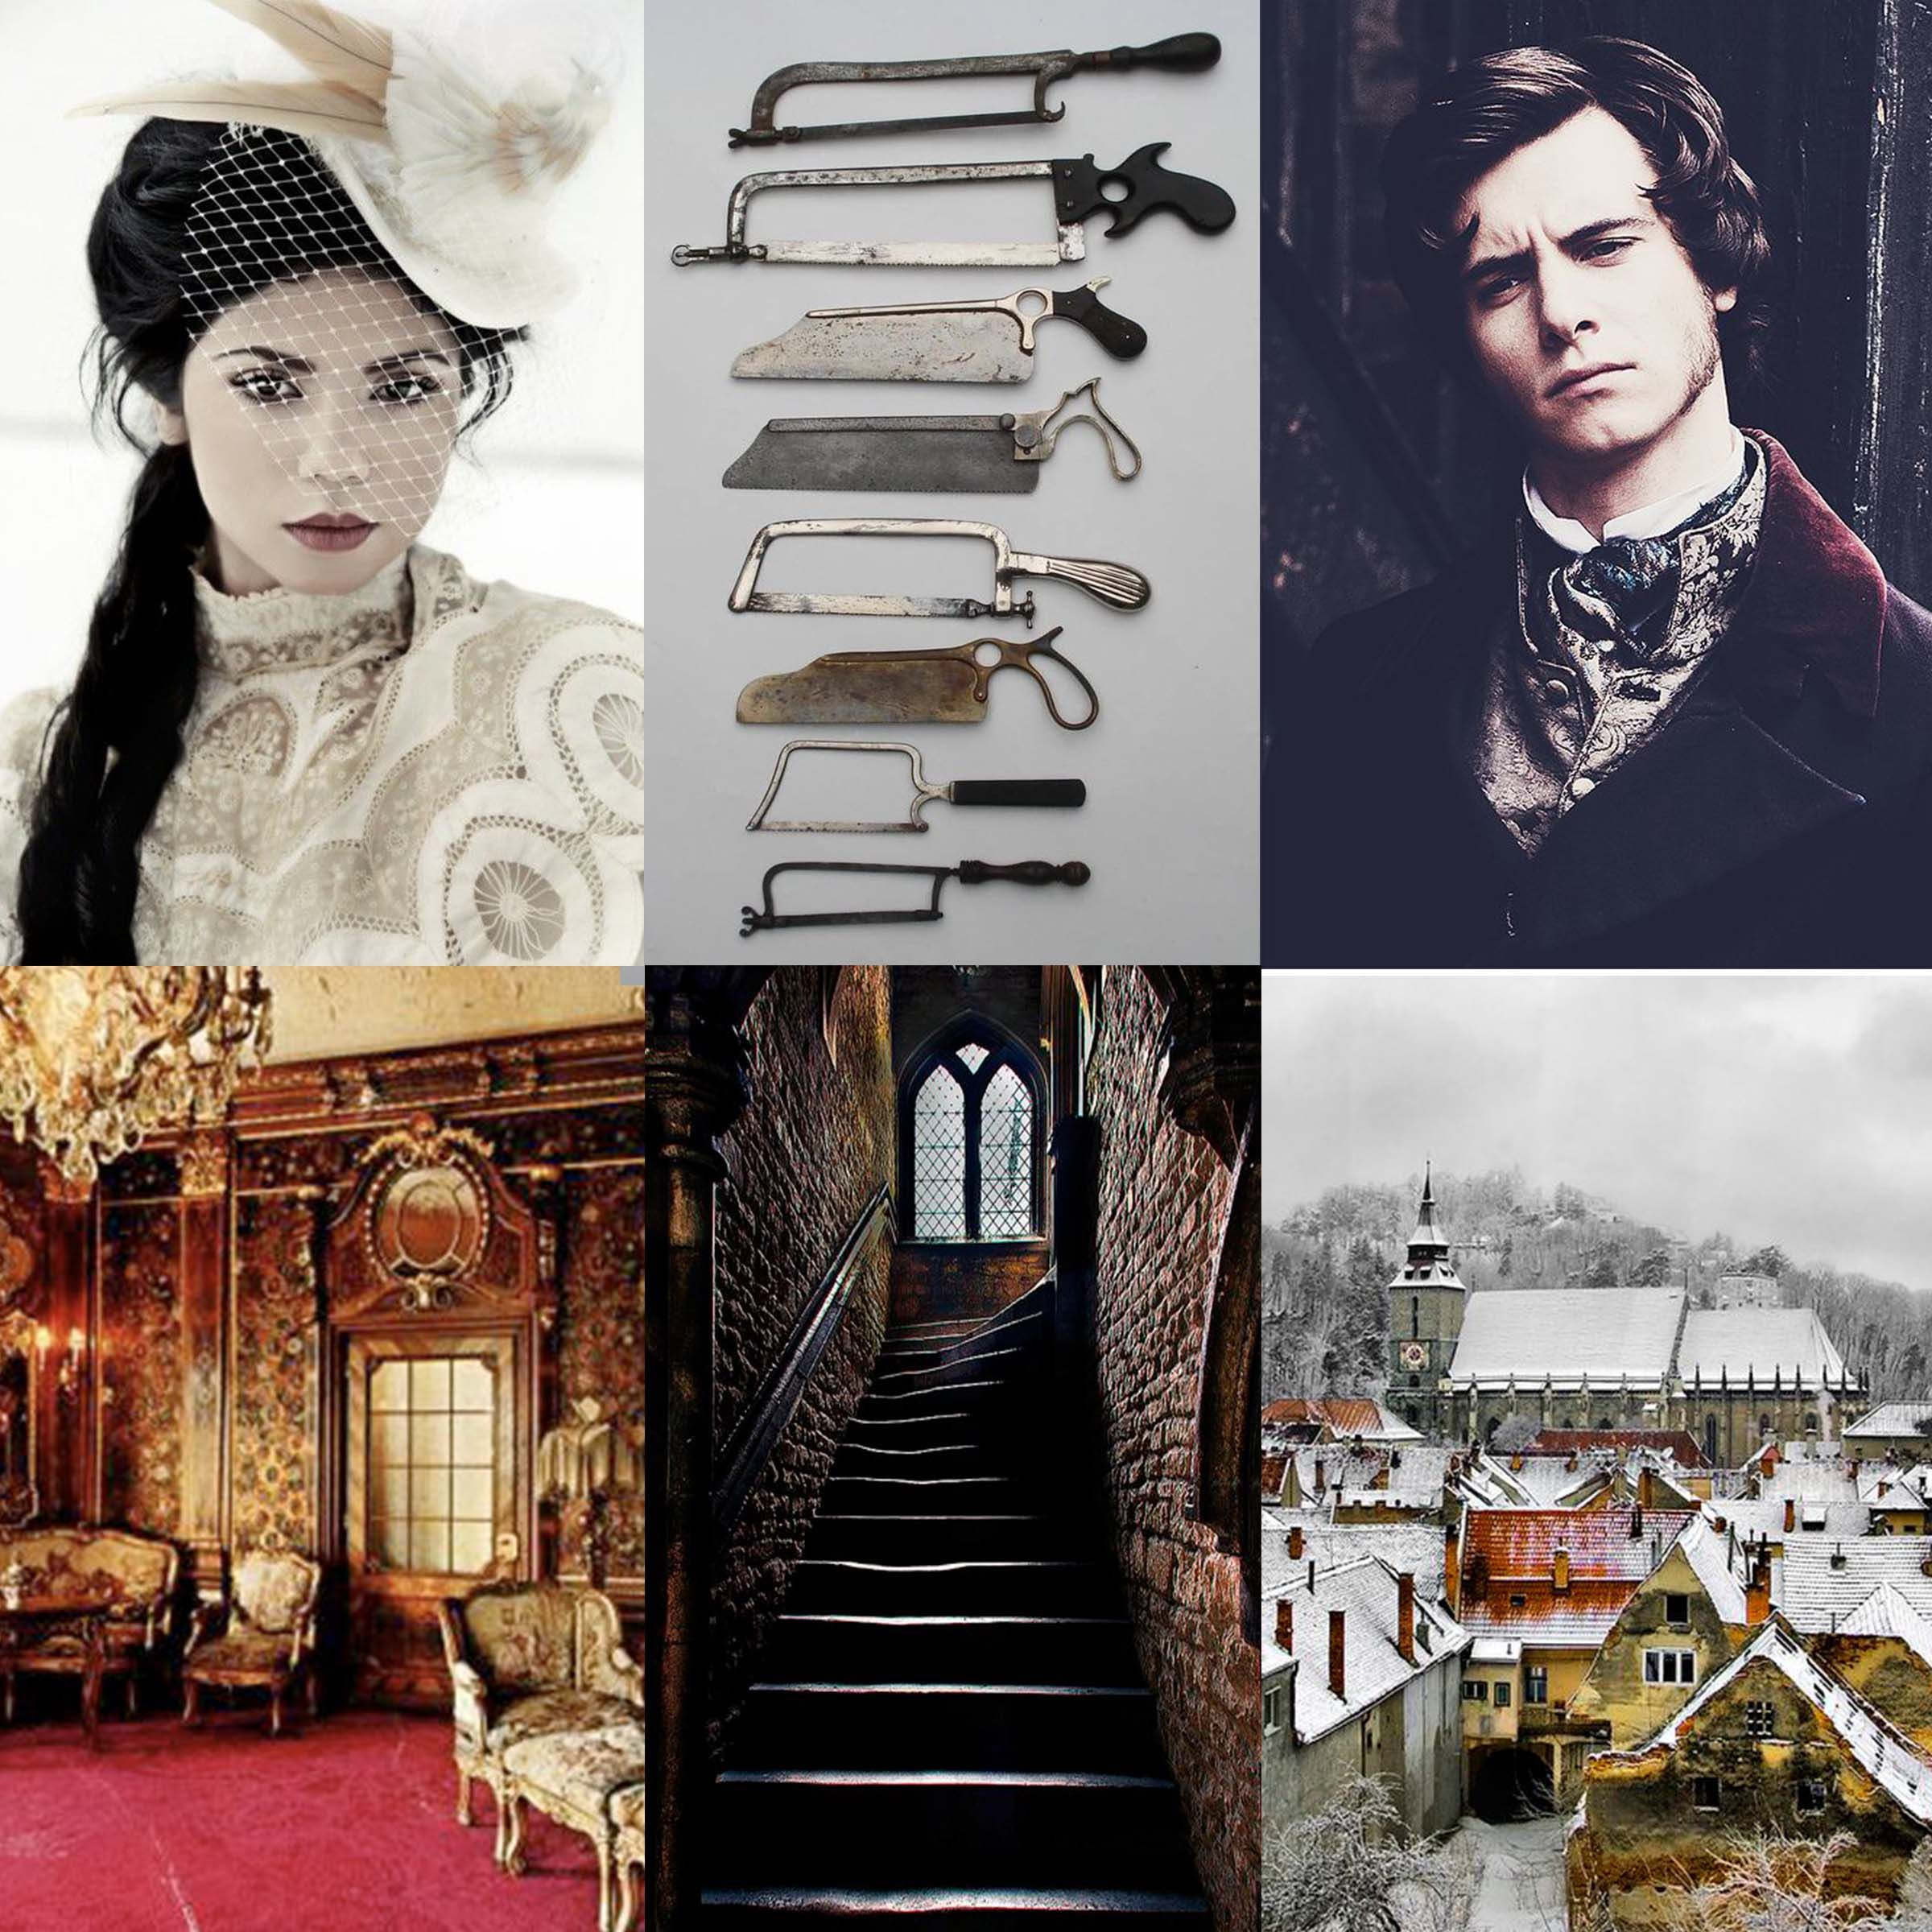 Hunting Prince Dracula by Kerri Maniscalco {@kerrimaniscalco}  #stalkingjacktheripper | Dracula book, Dracula, Book characters